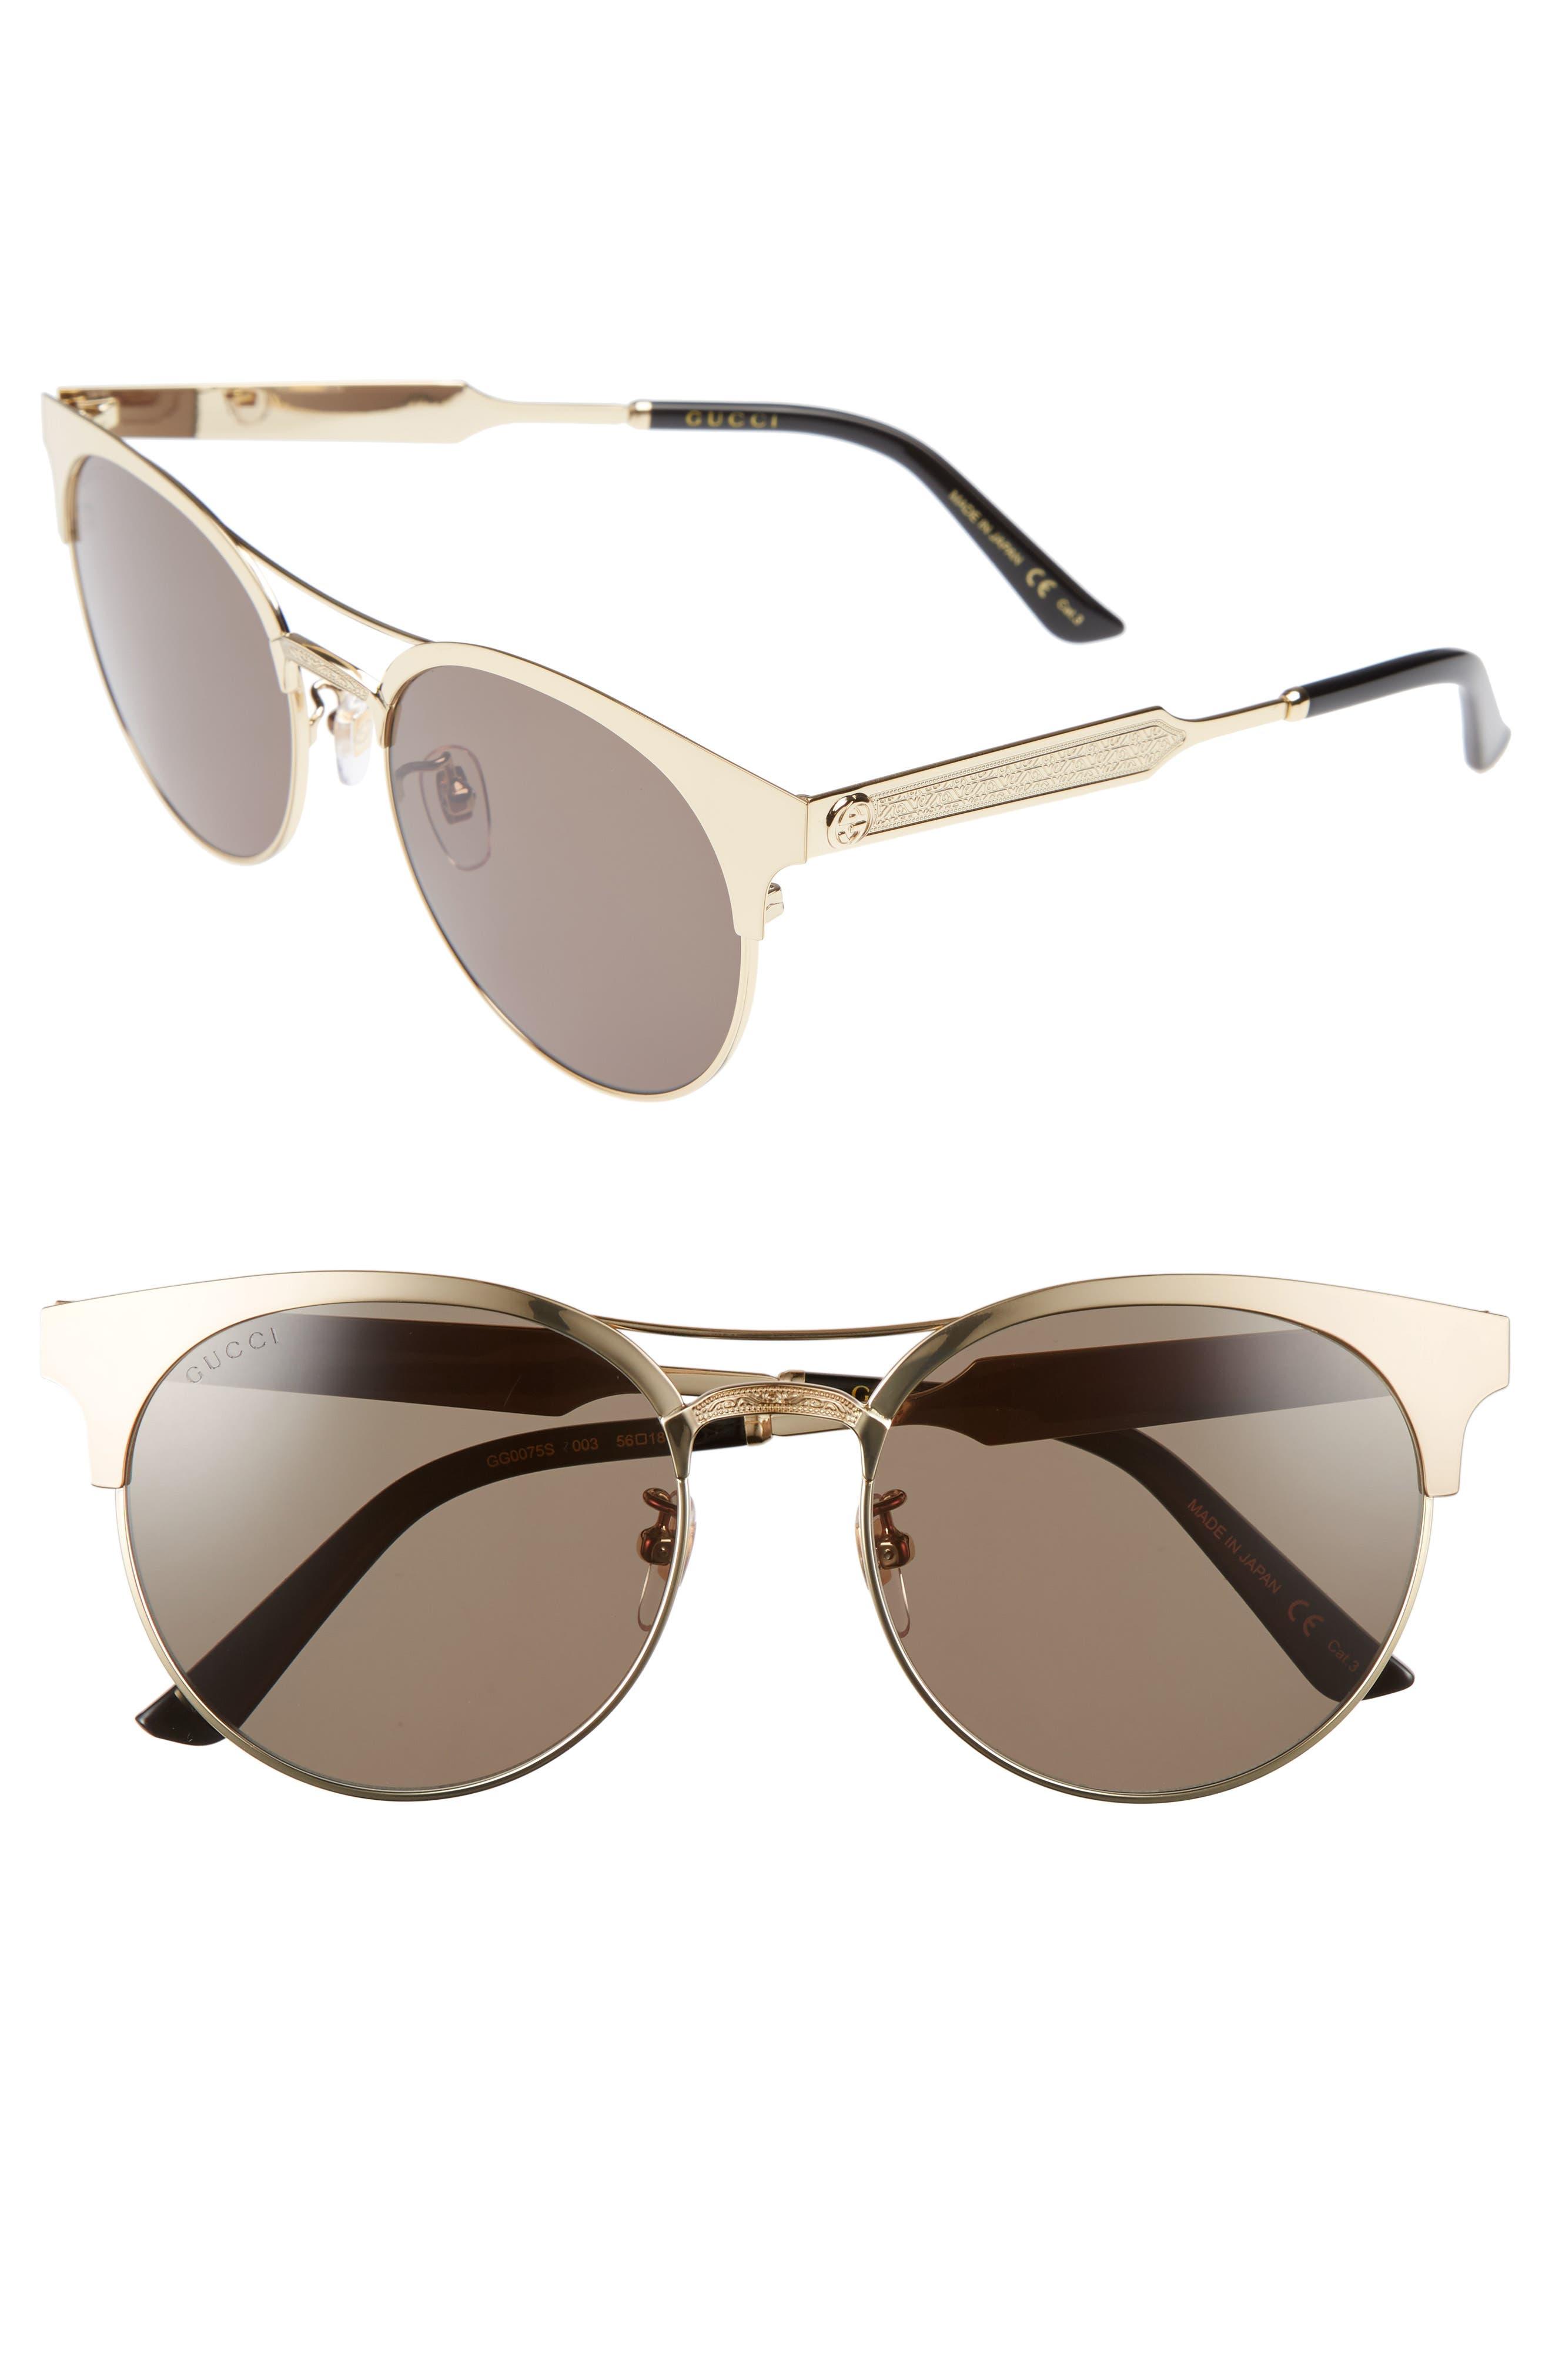 56mm Retro Sunglasses,                             Main thumbnail 2, color,